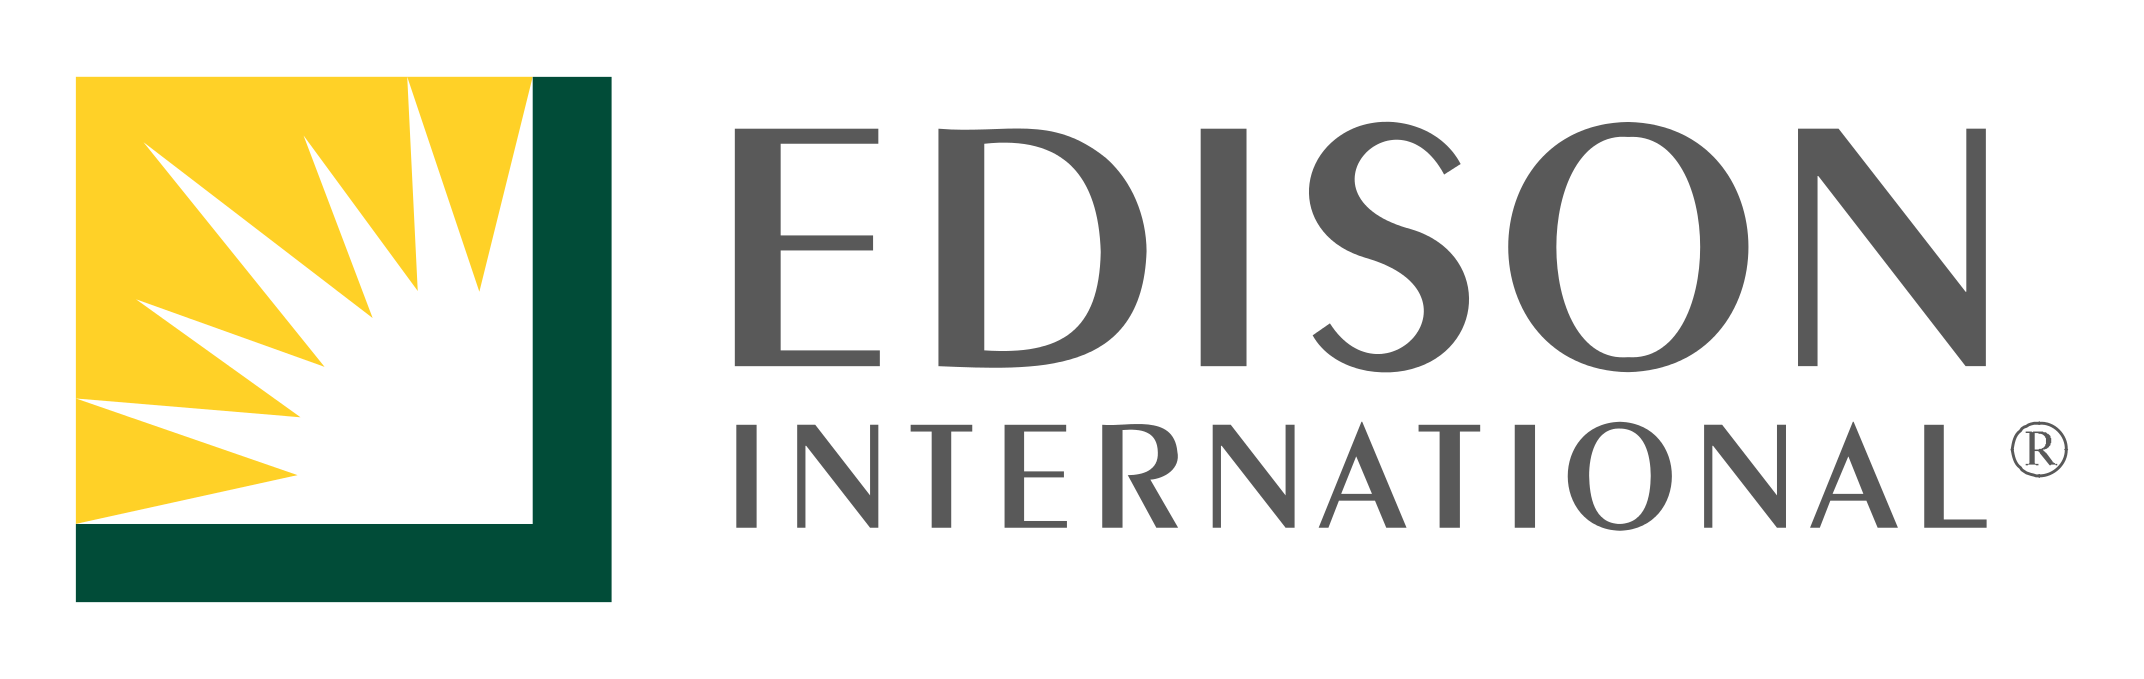 edison-international.png